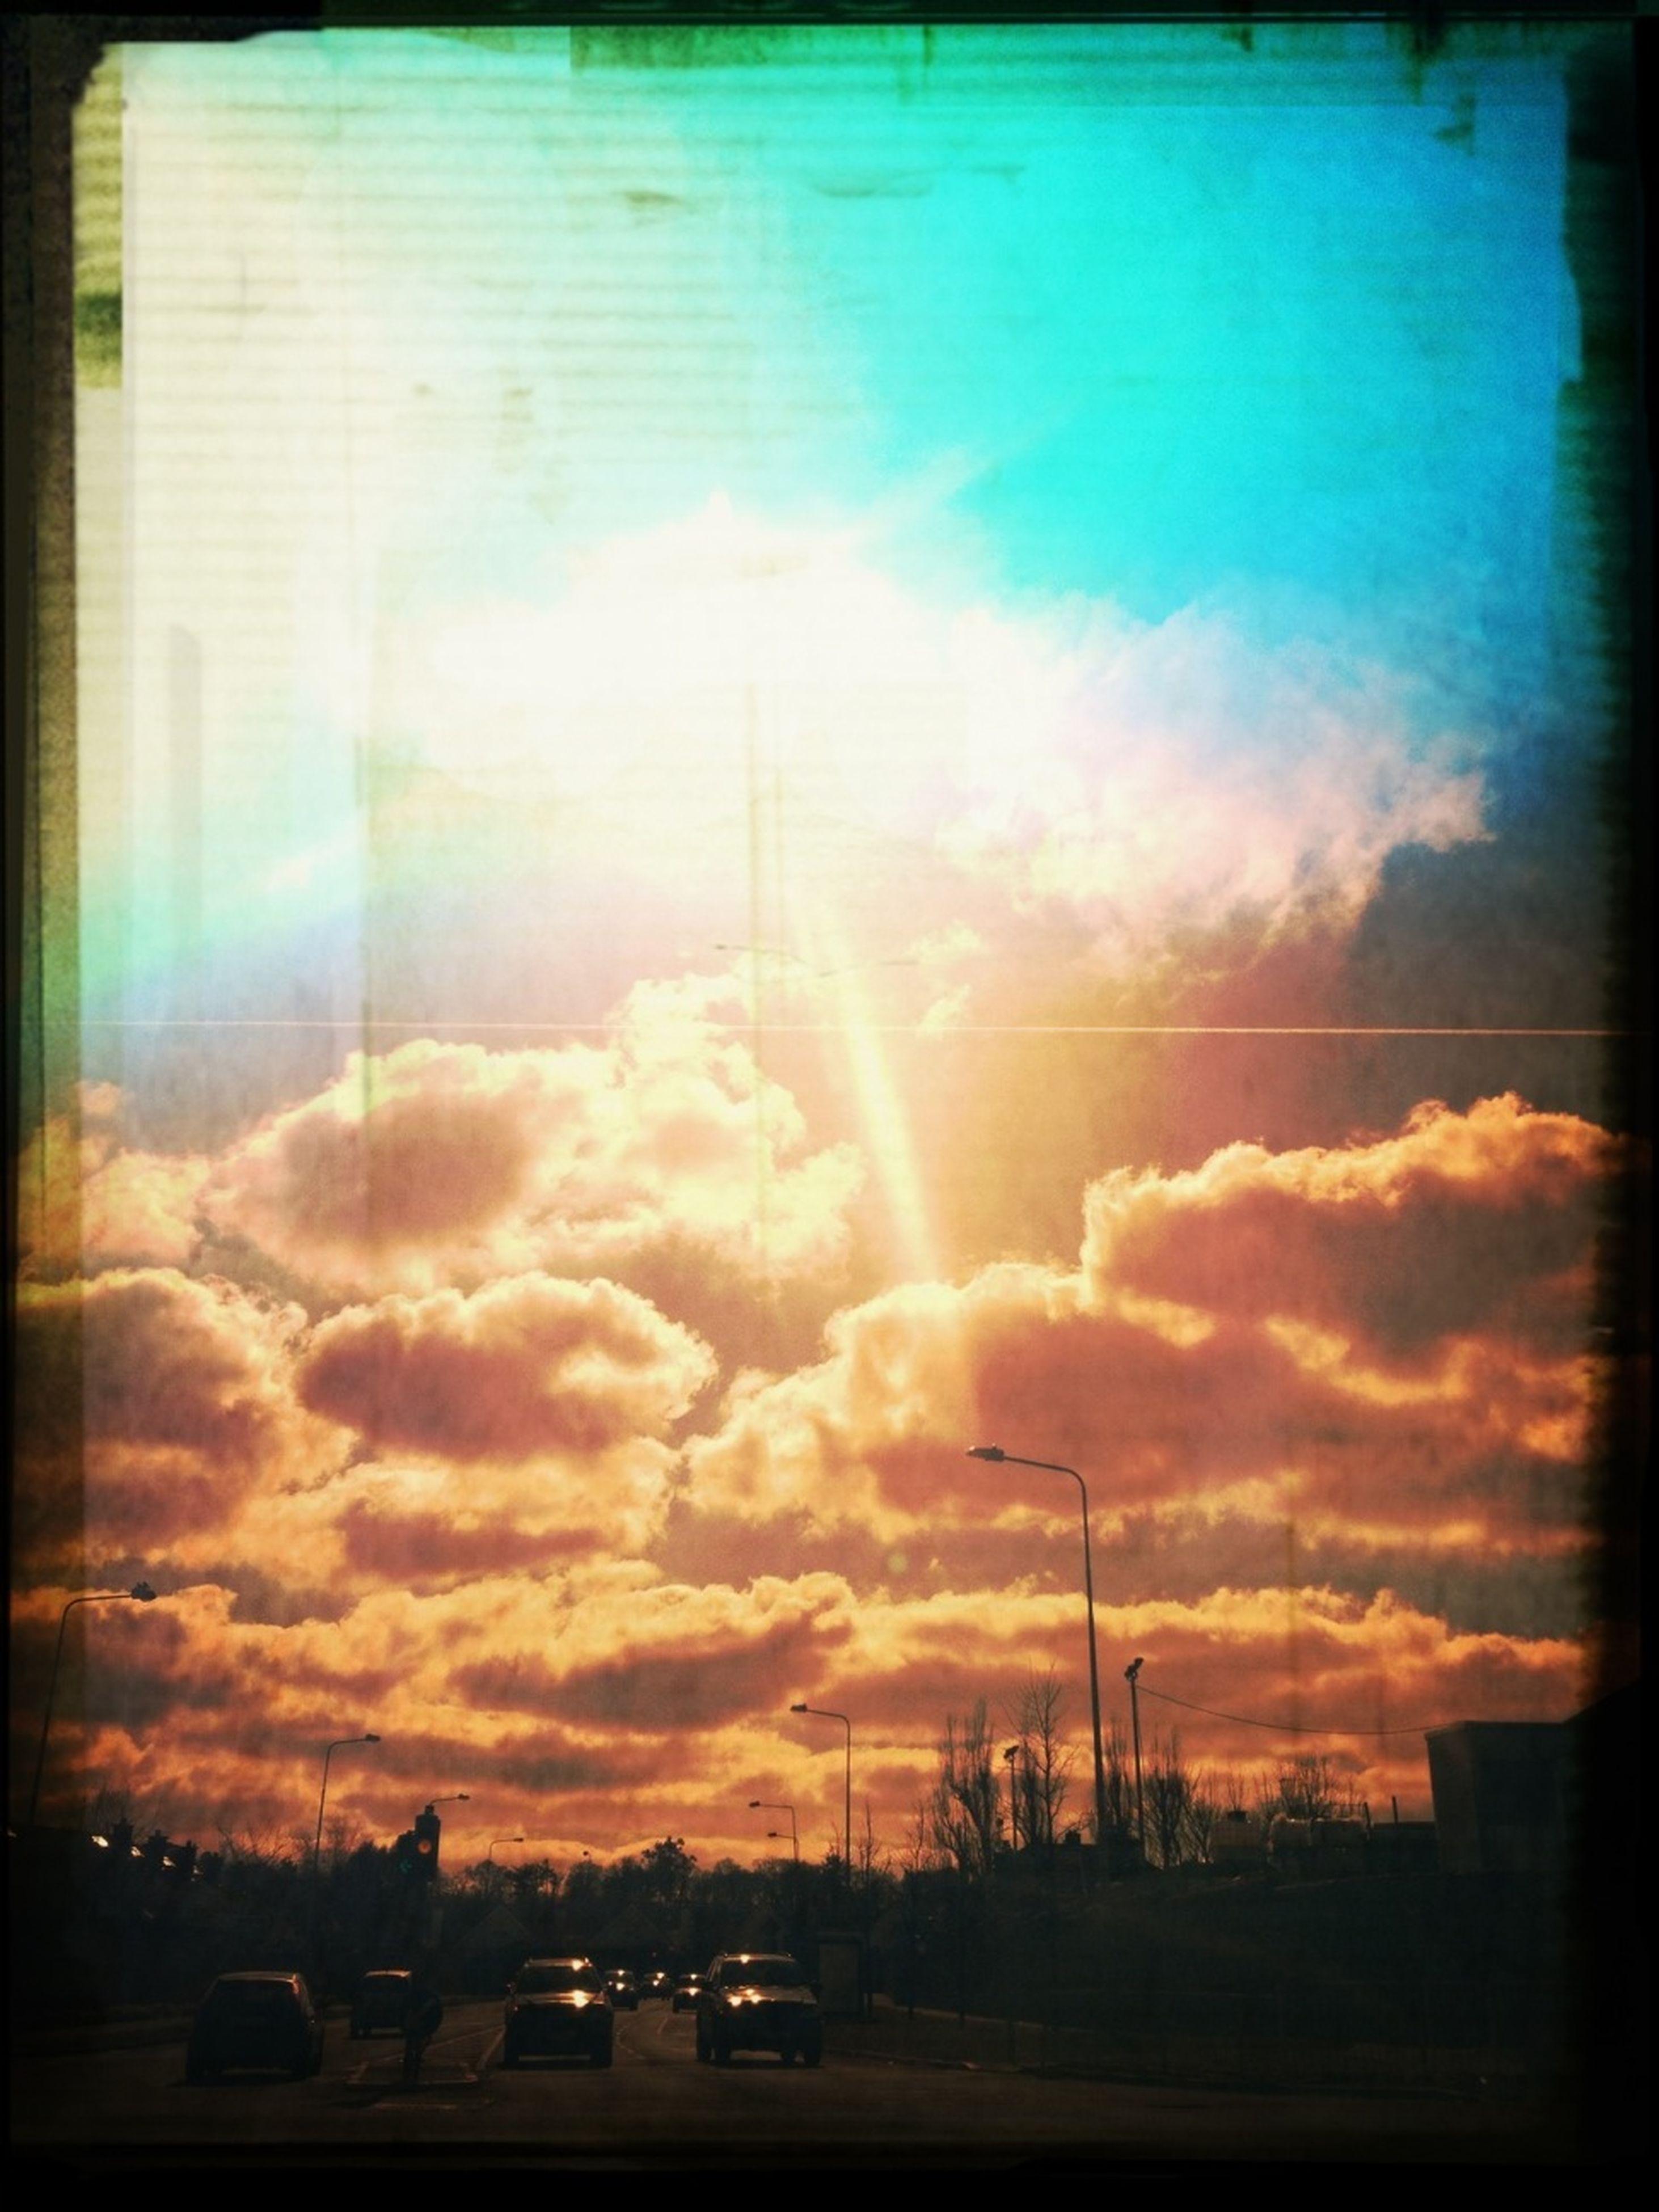 sunset, transportation, sky, car, silhouette, transfer print, mode of transport, cloud - sky, land vehicle, auto post production filter, dramatic sky, orange color, cloudy, road, cloud, beauty in nature, nature, sun, street light, scenics